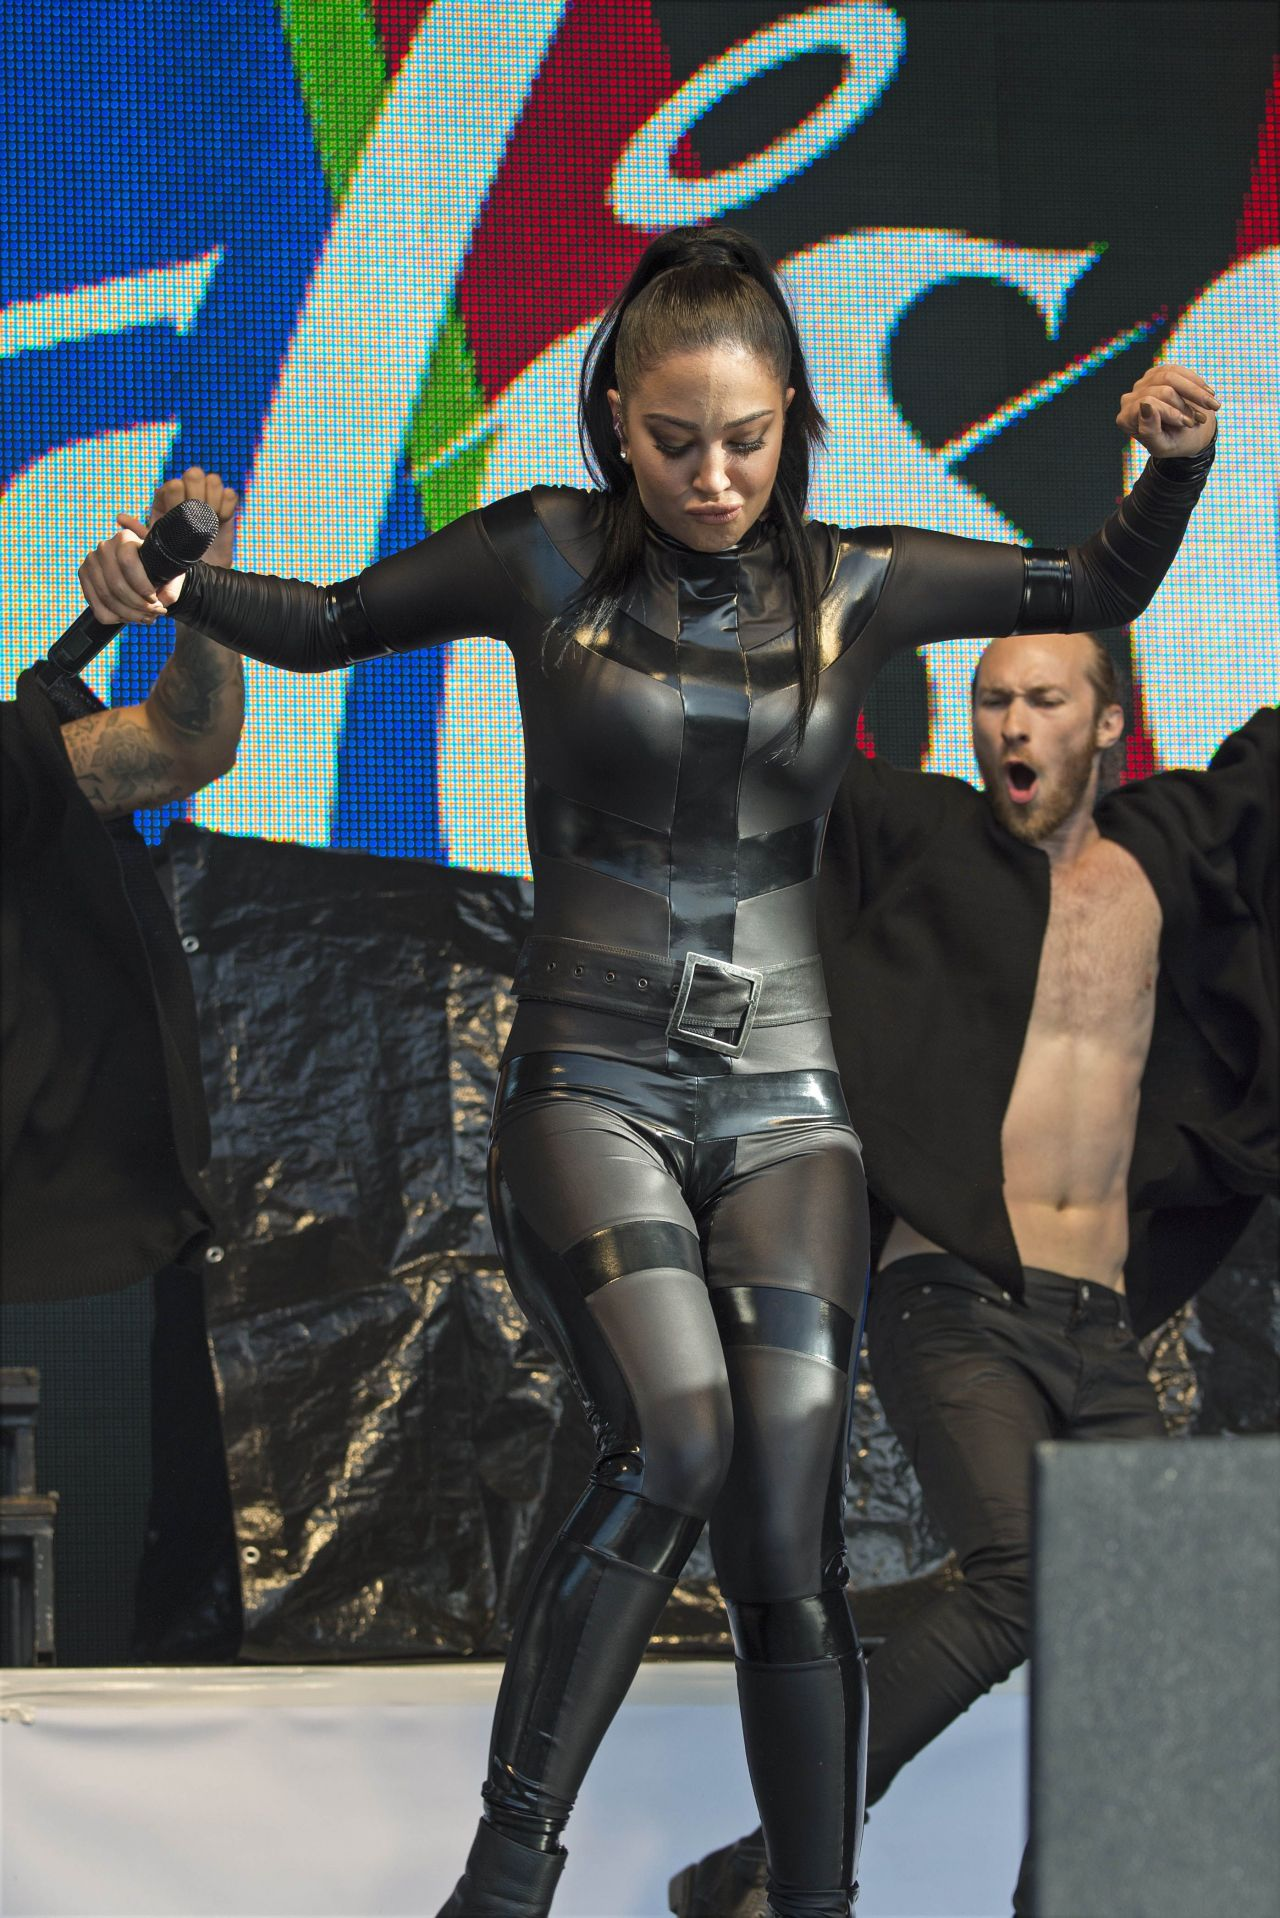 Tulisa Contostavlos in Rubber Catsuit  Live Brighton Gay